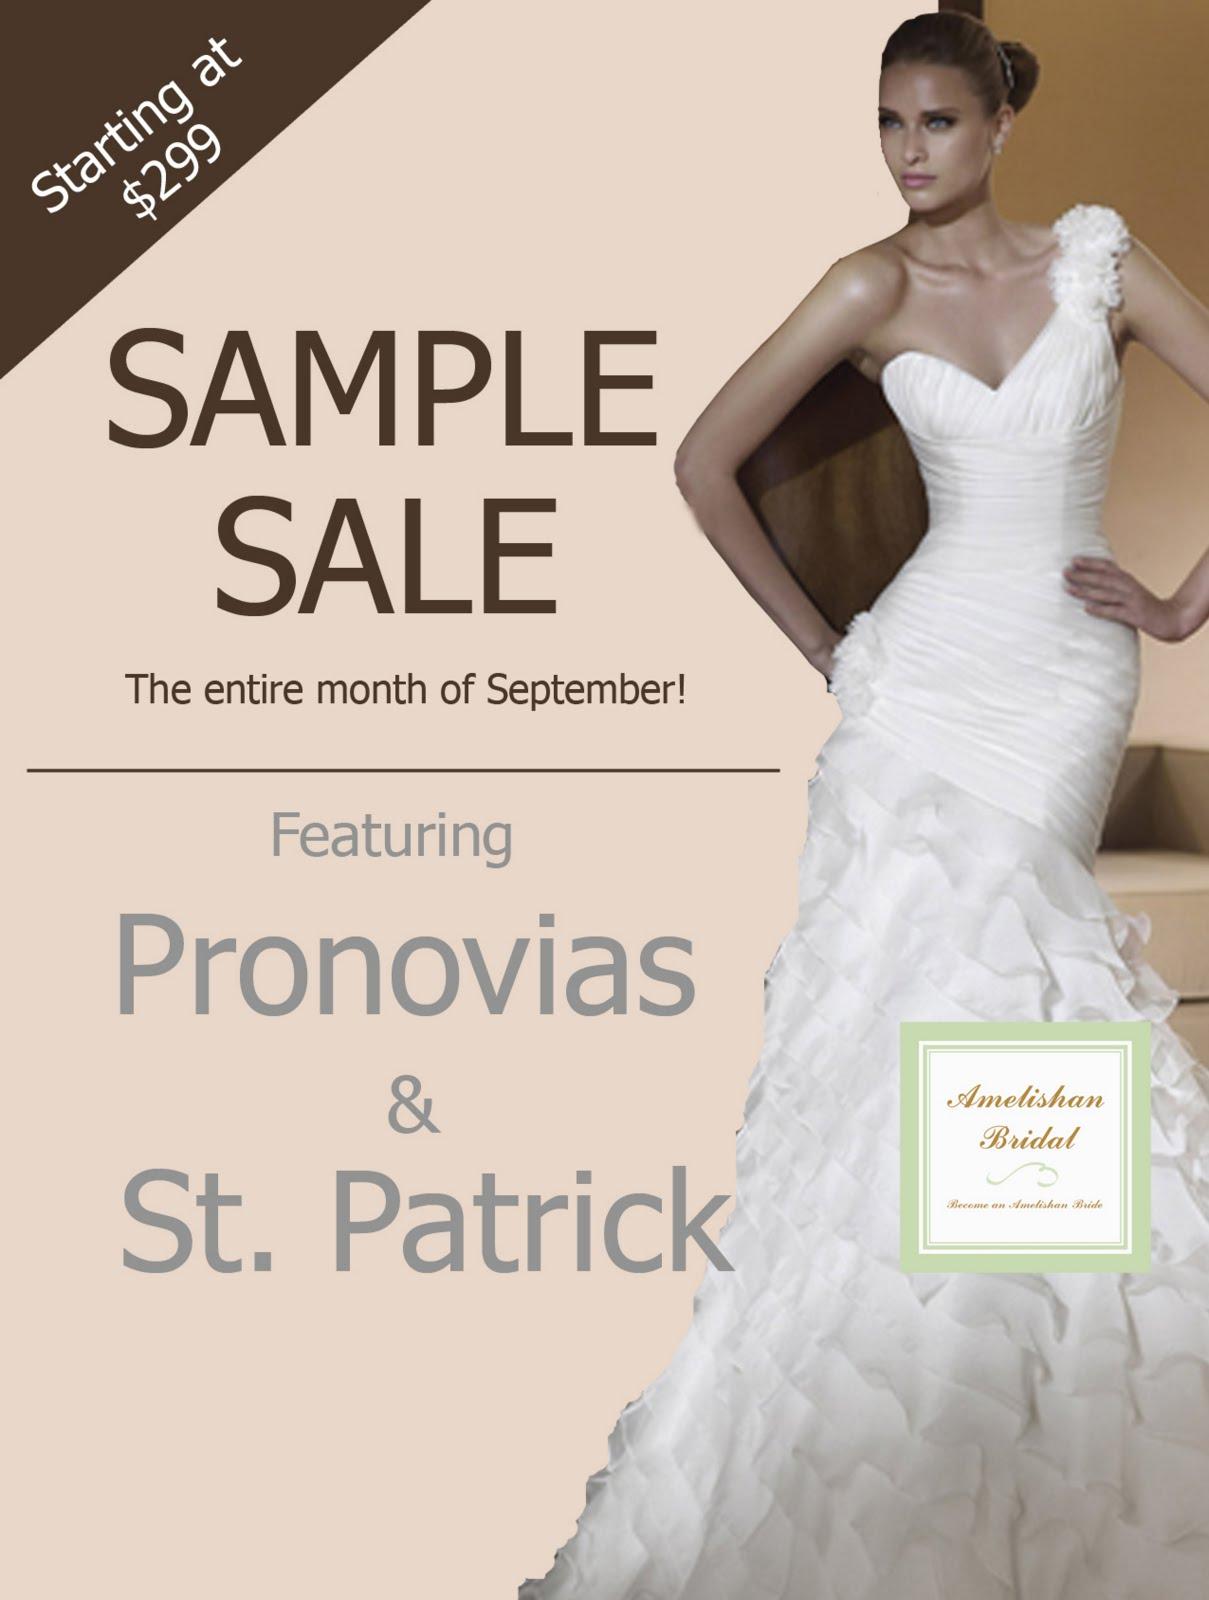 Amelishan bridal pronovias and san patrick bridal sample sale for Wedding dress sample sale san francisco